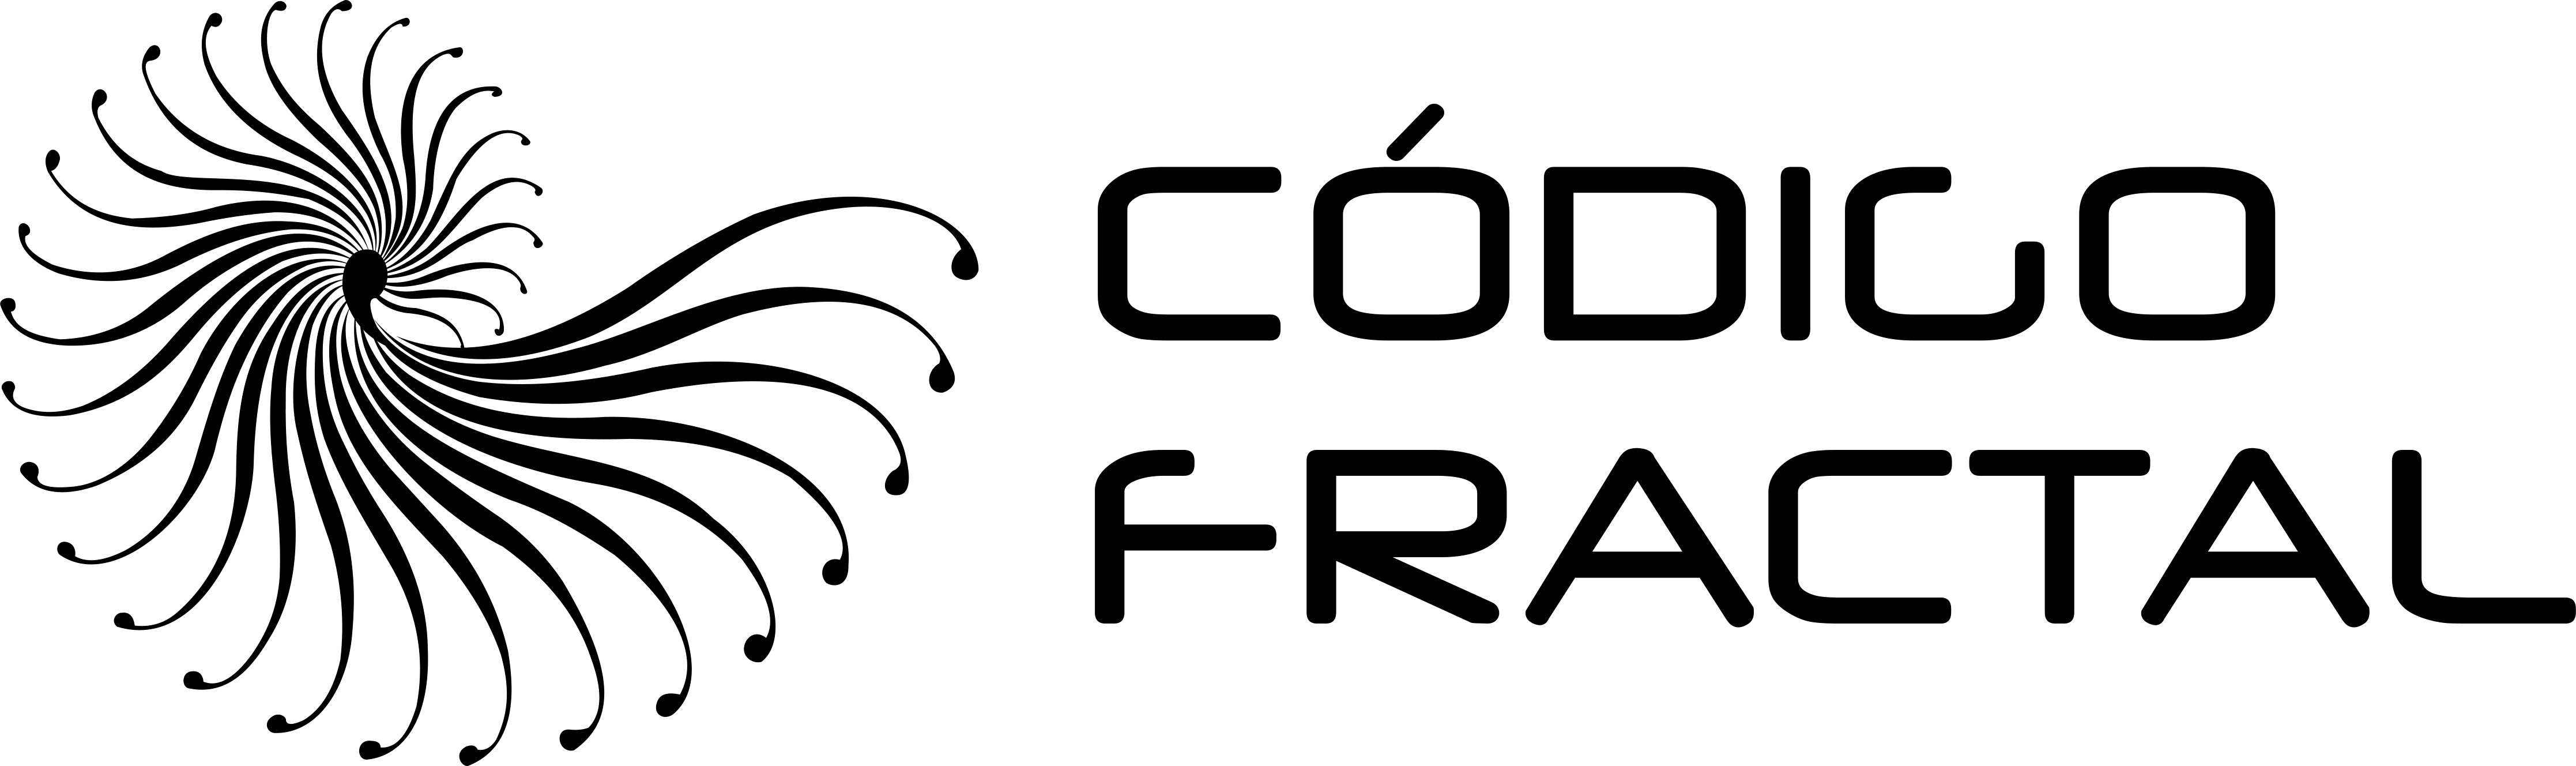 Código Fractal